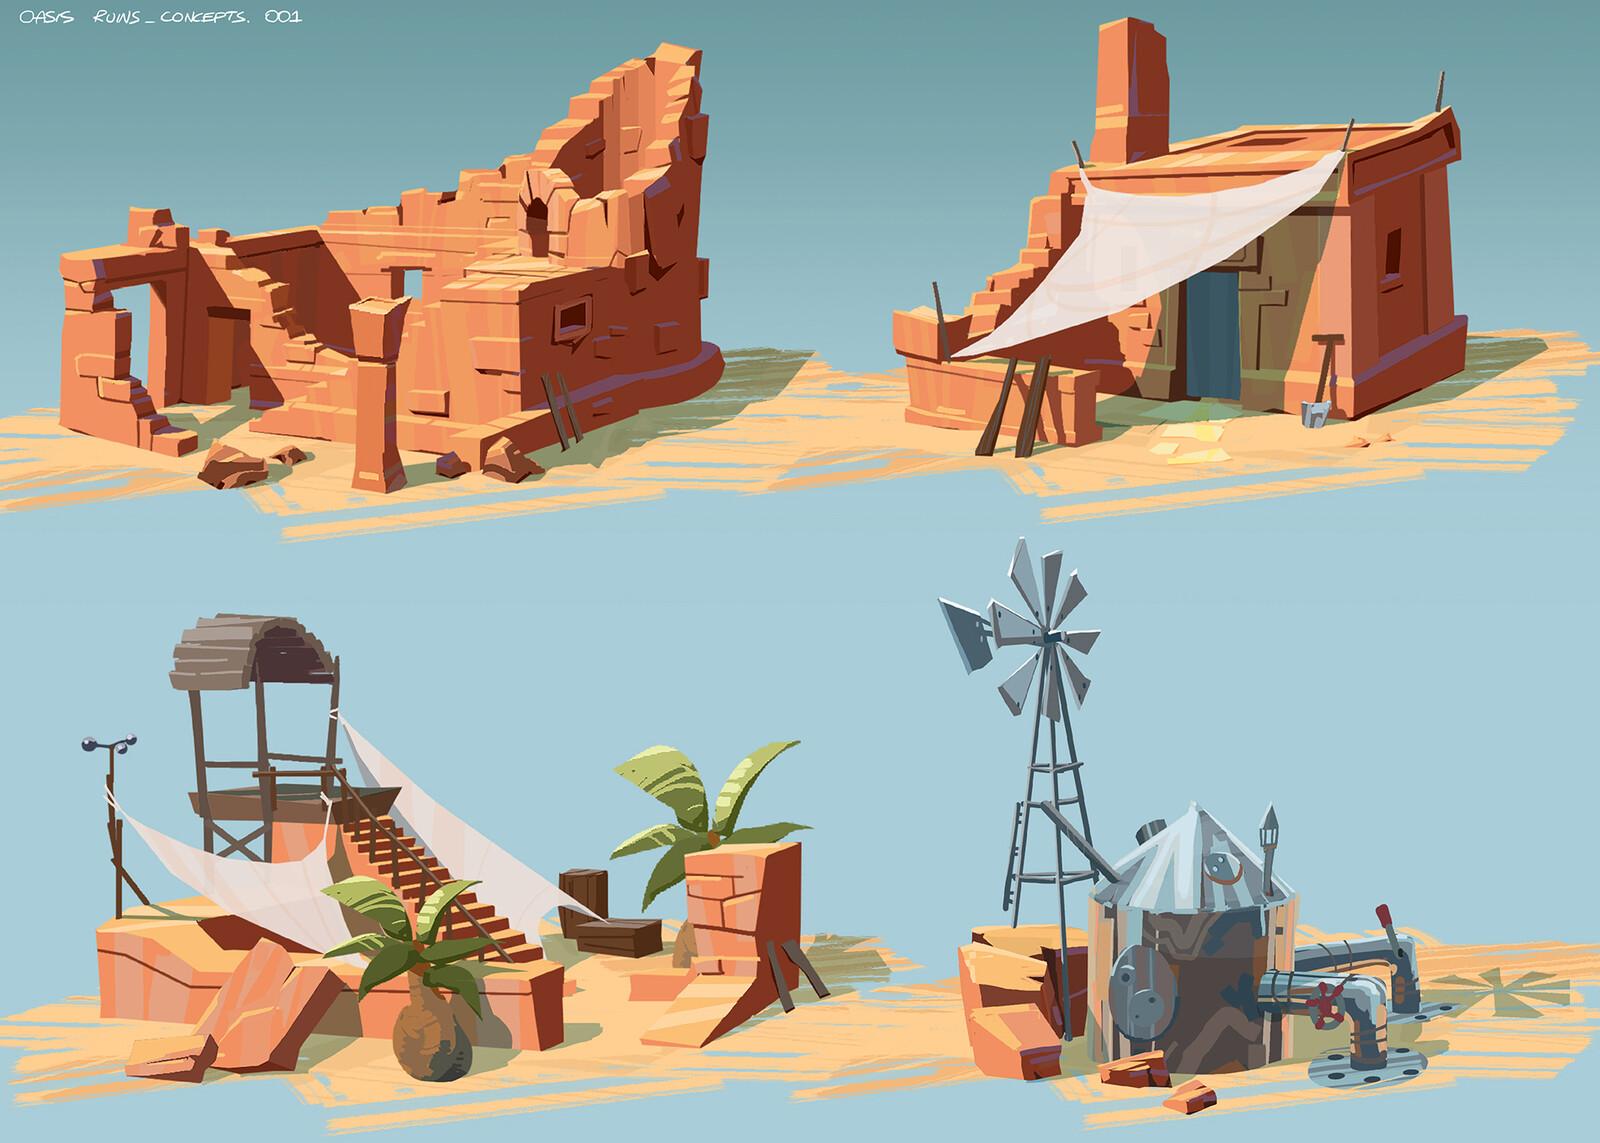 Desert callouts